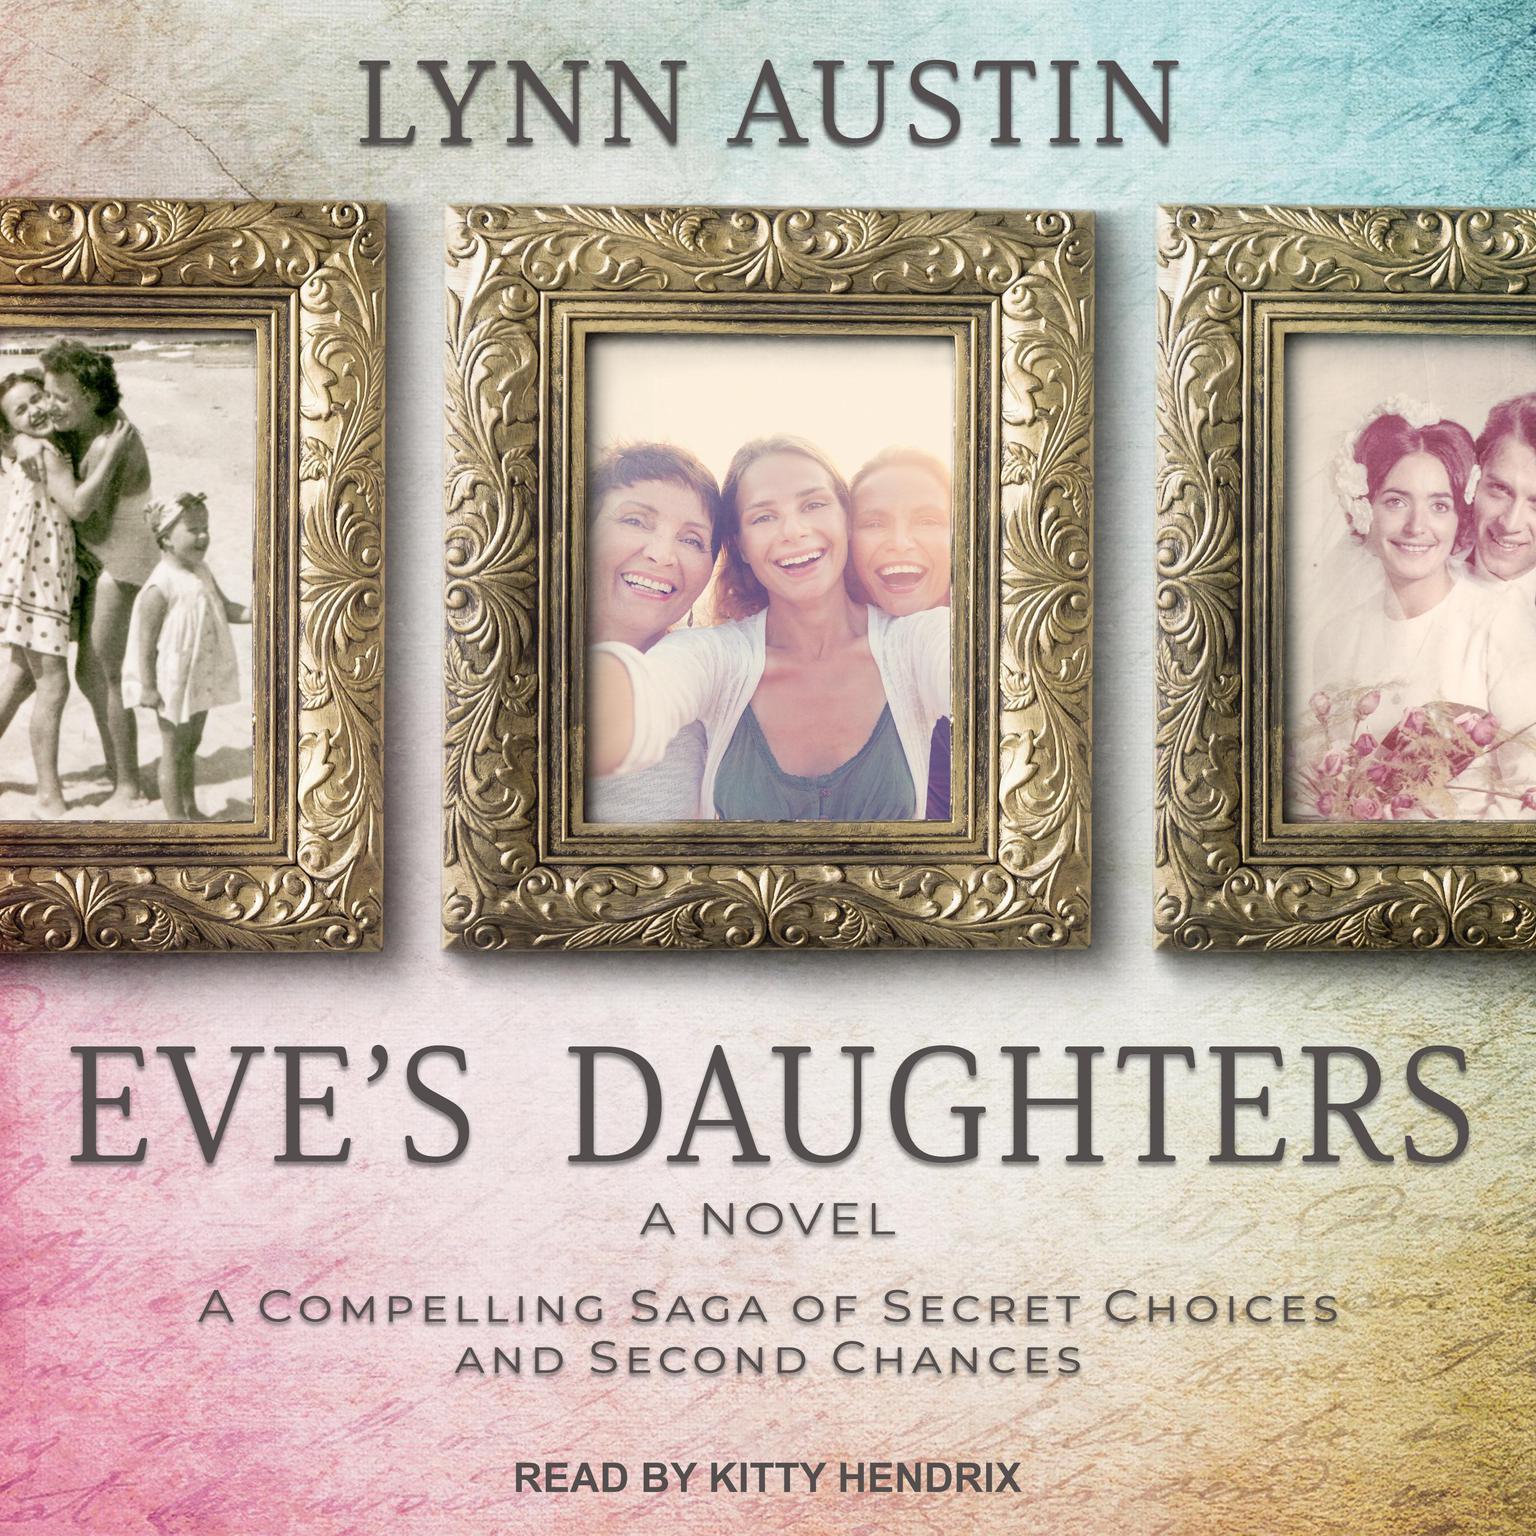 Eves Daughters Audiobook, by Lynn Austin